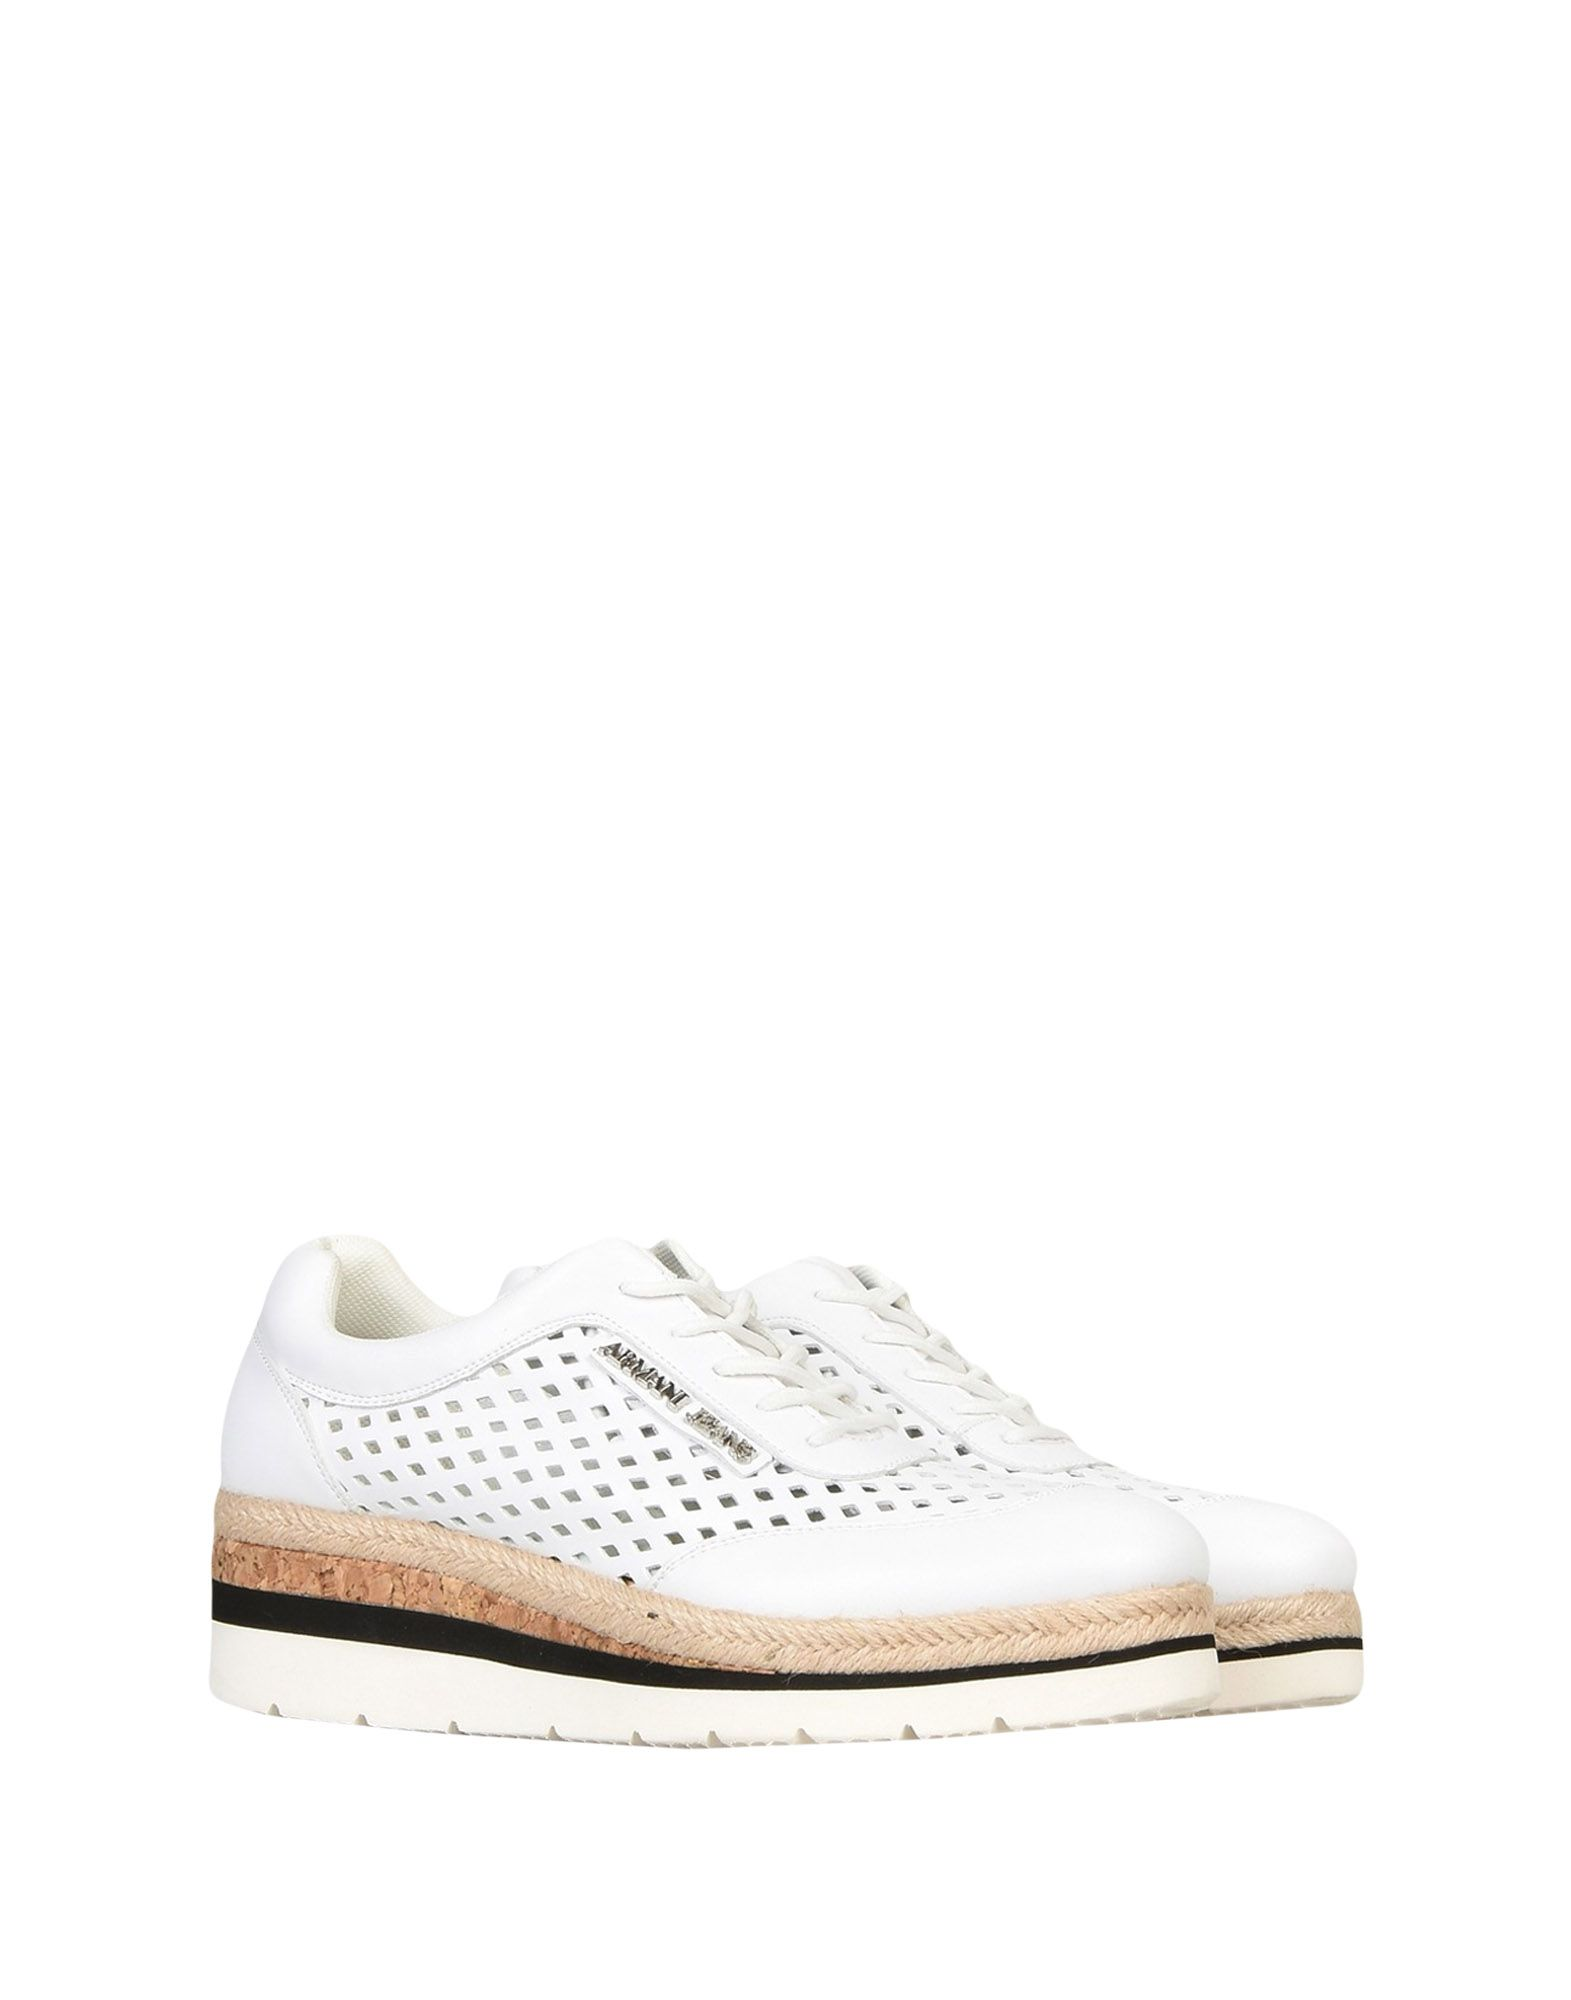 ARMANI JEANS Обувь на шнурках endless обувь на шнурках